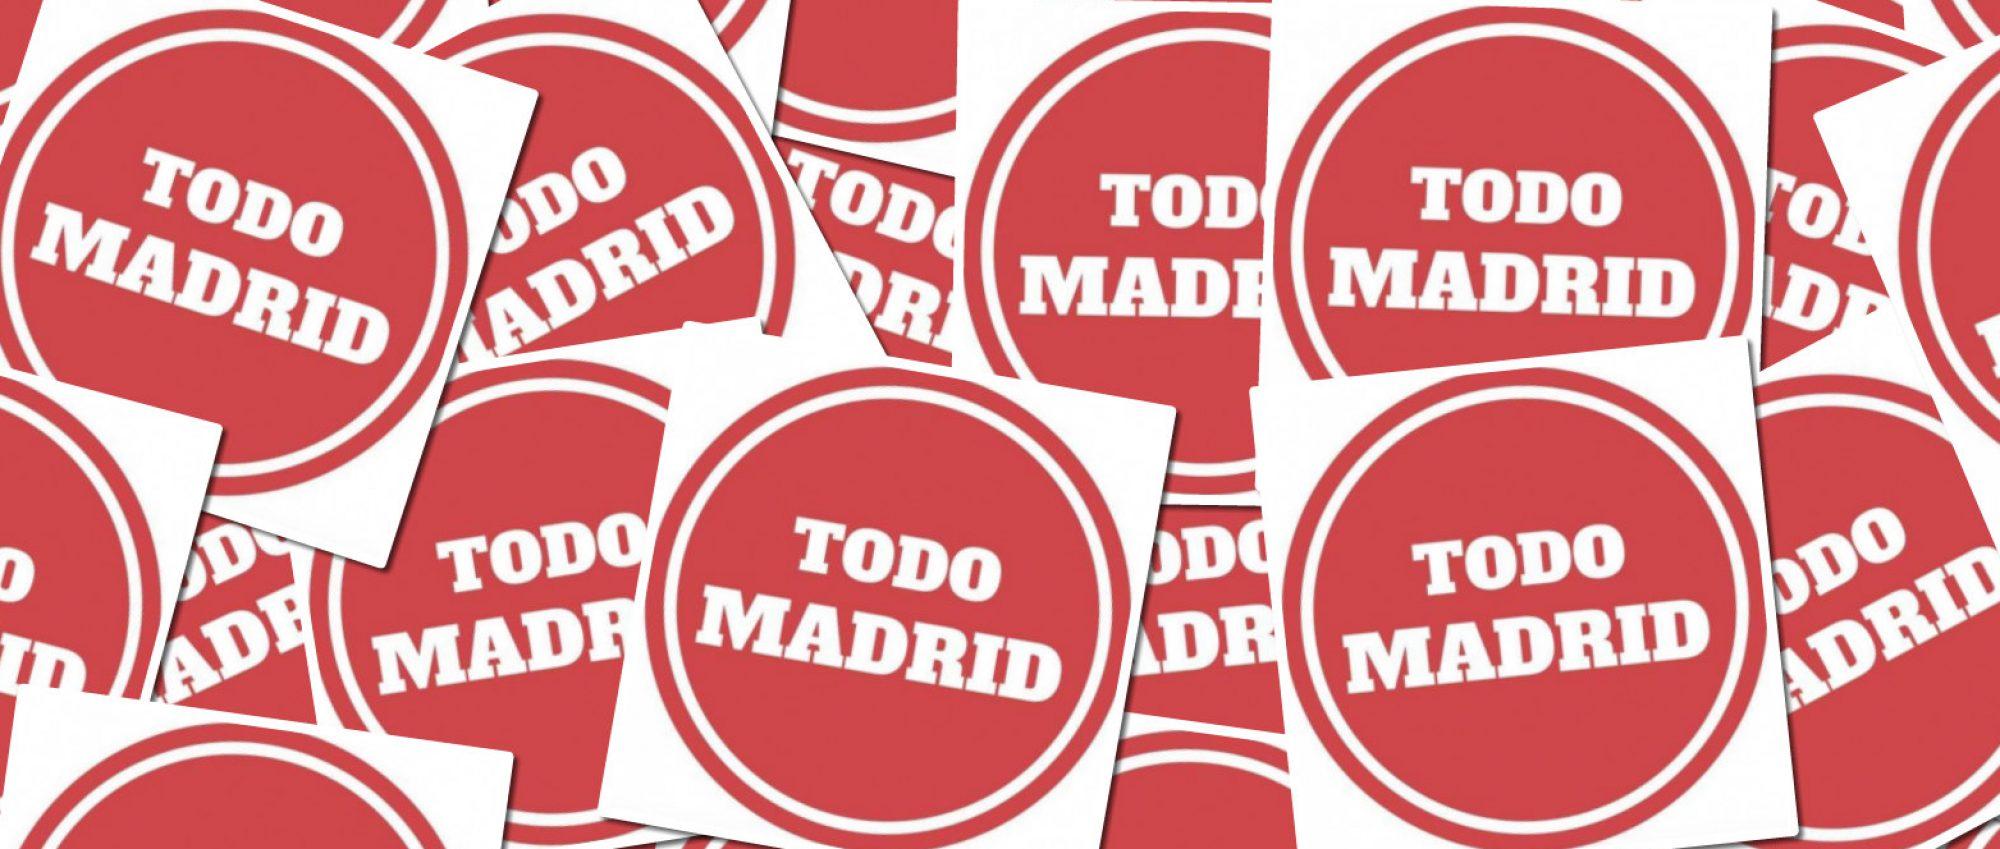 Todo Madrid